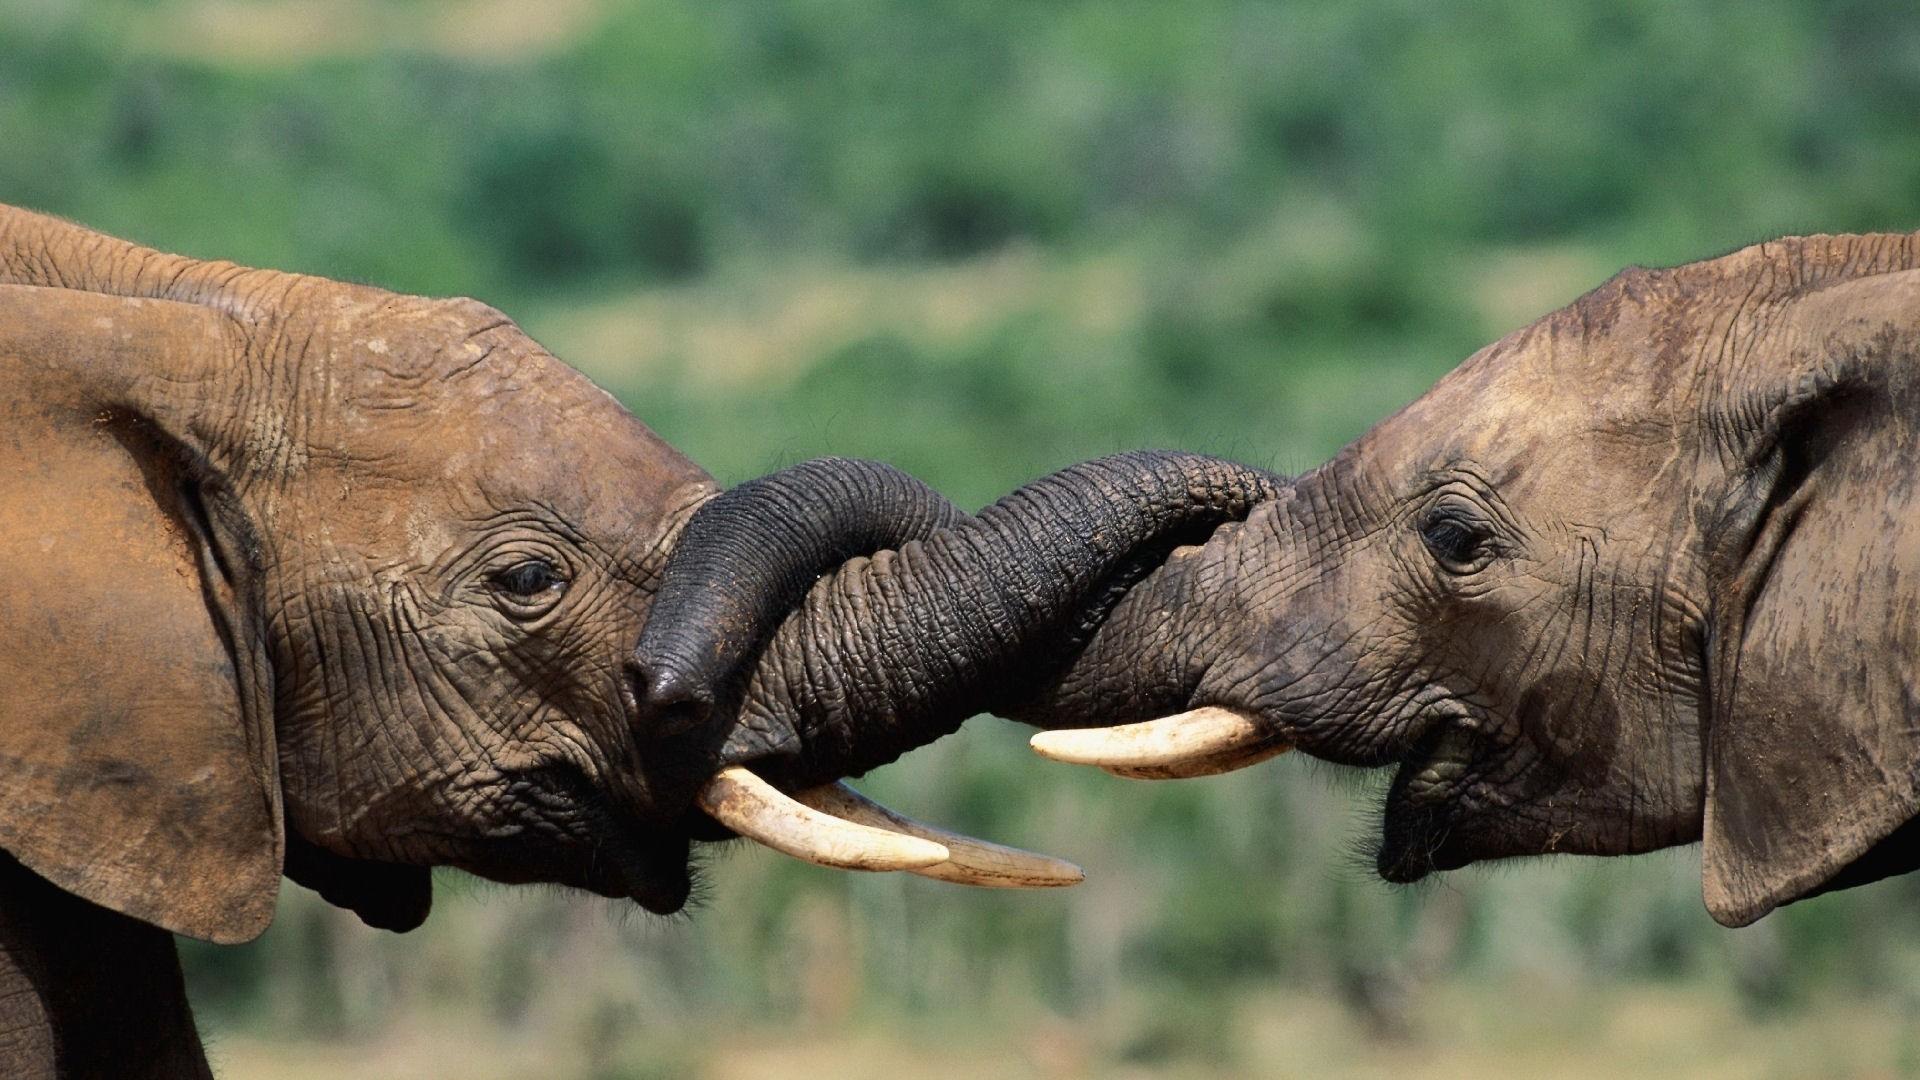 elephant wallpapers hd